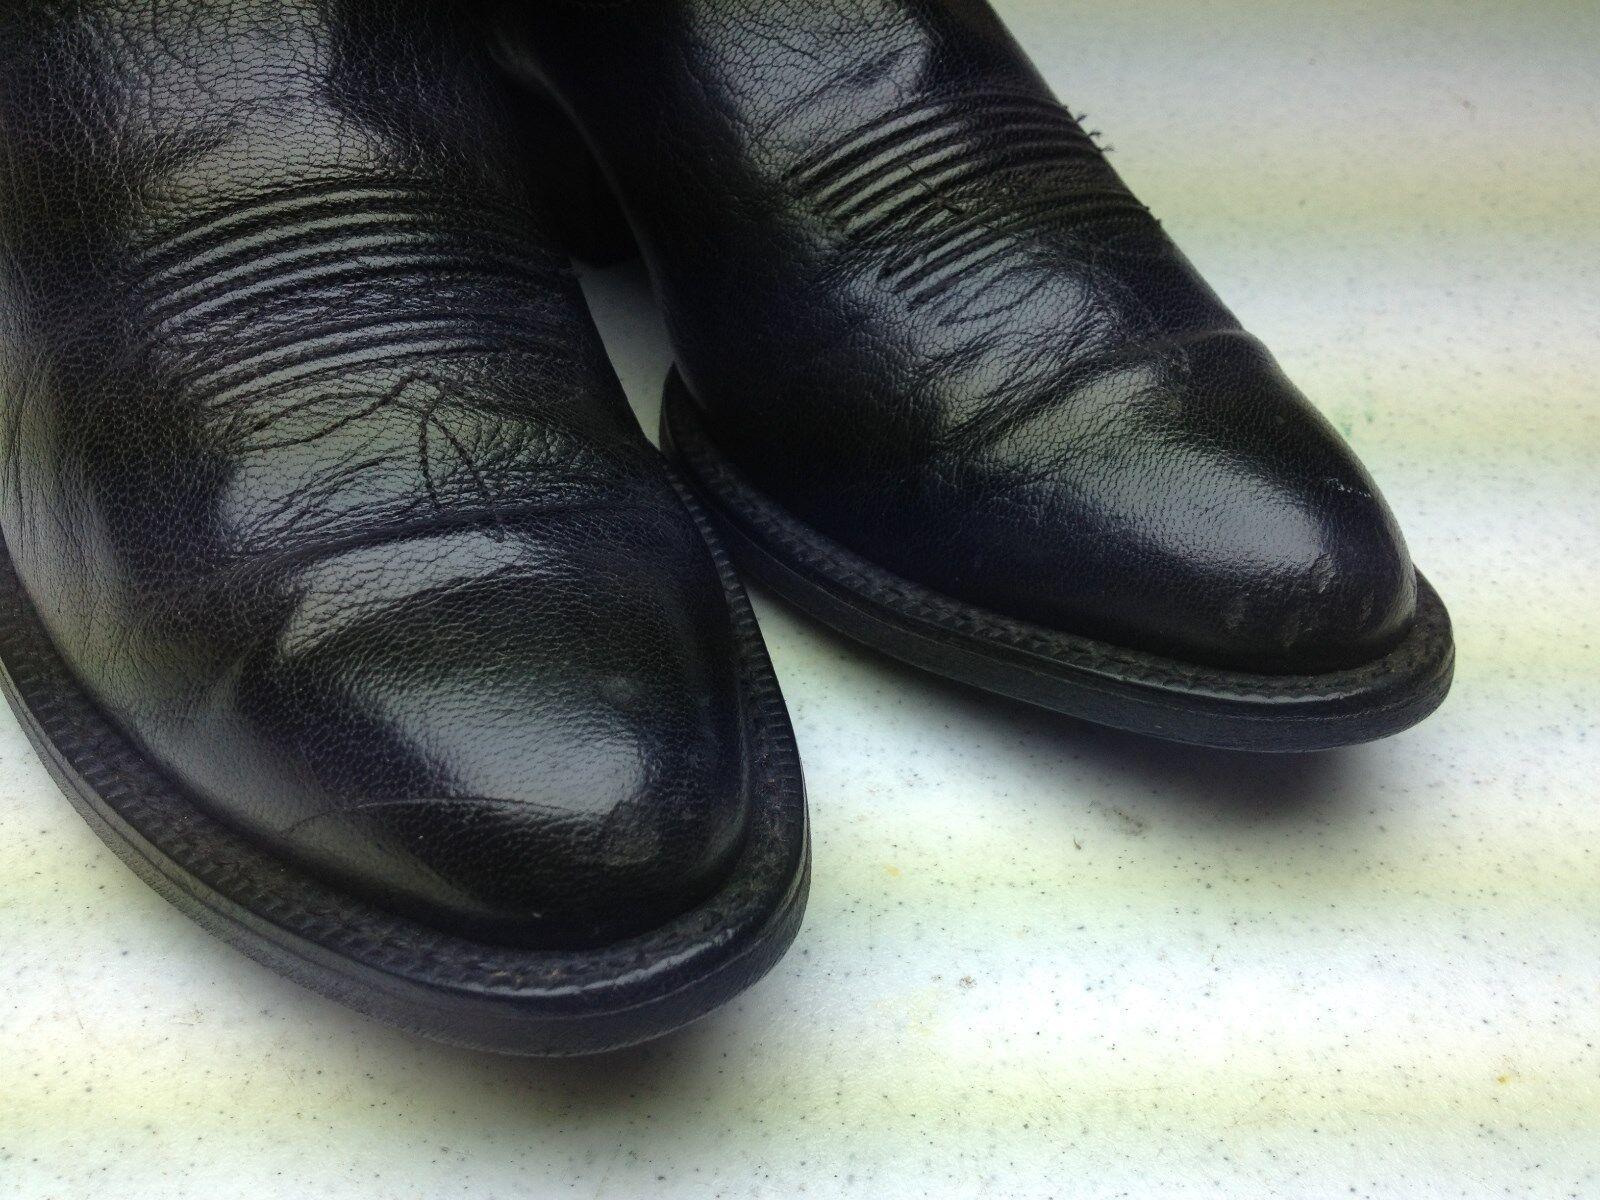 schwarz DISTRESSED LEATHER LEATHER LEATHER ARIAT WESTERN ROCKABILLY COWBOY Stiefel 8.5 D 819559